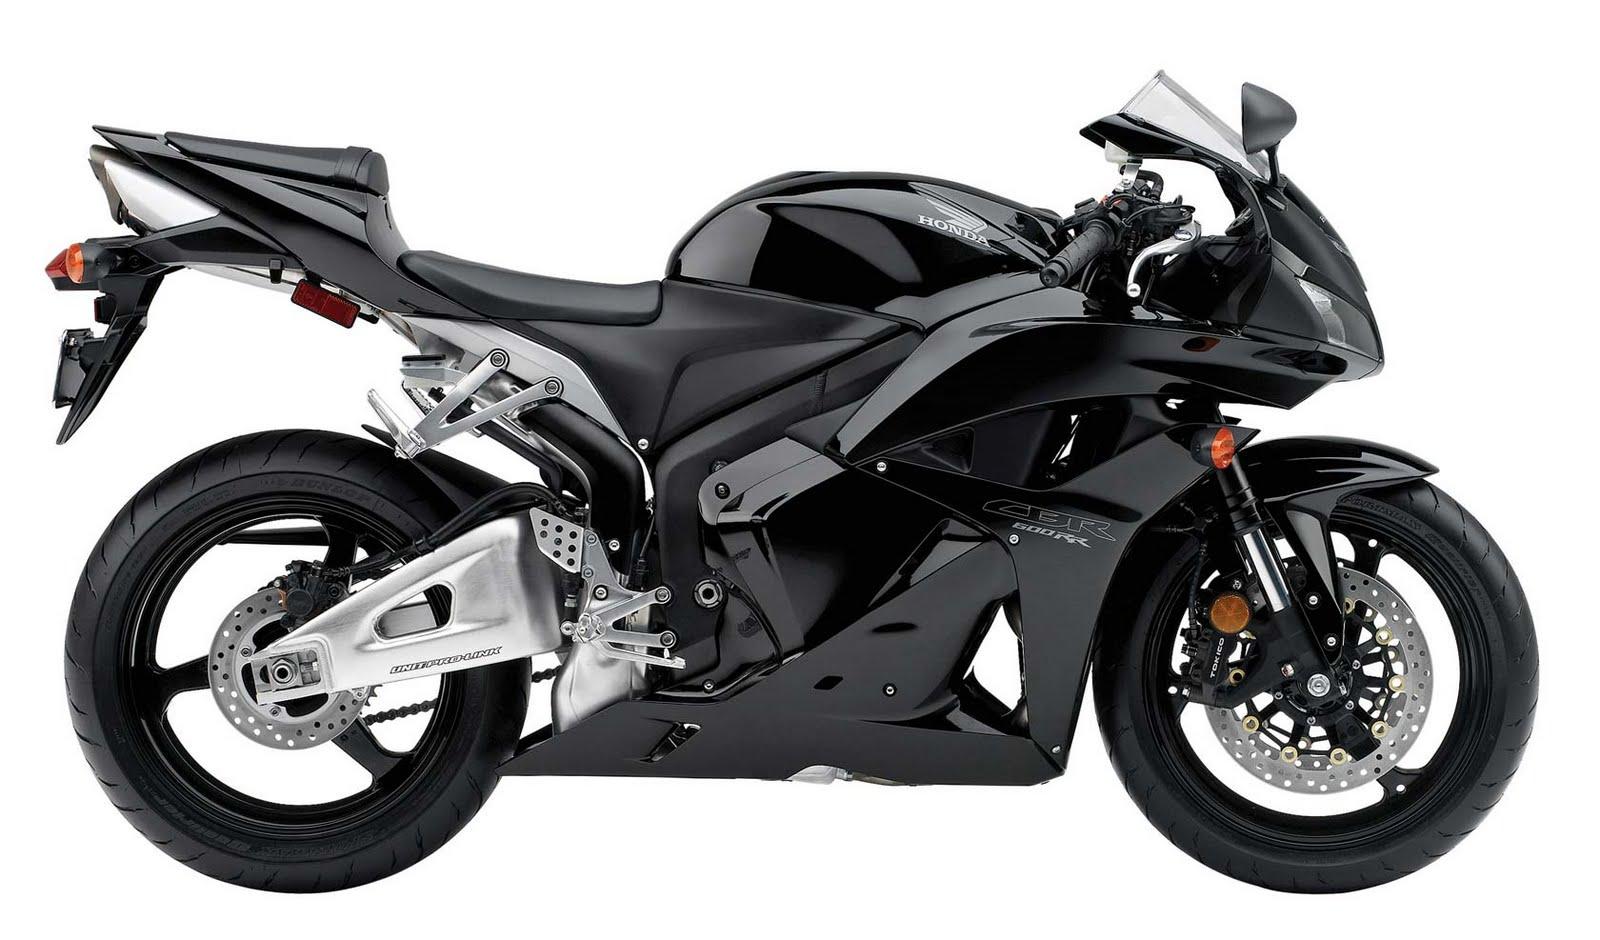 The Bests Of Motorcycle October 2010 All New Cbr 150r Racing Red Salatiga 2011 Honda Cbr600rr Black Color